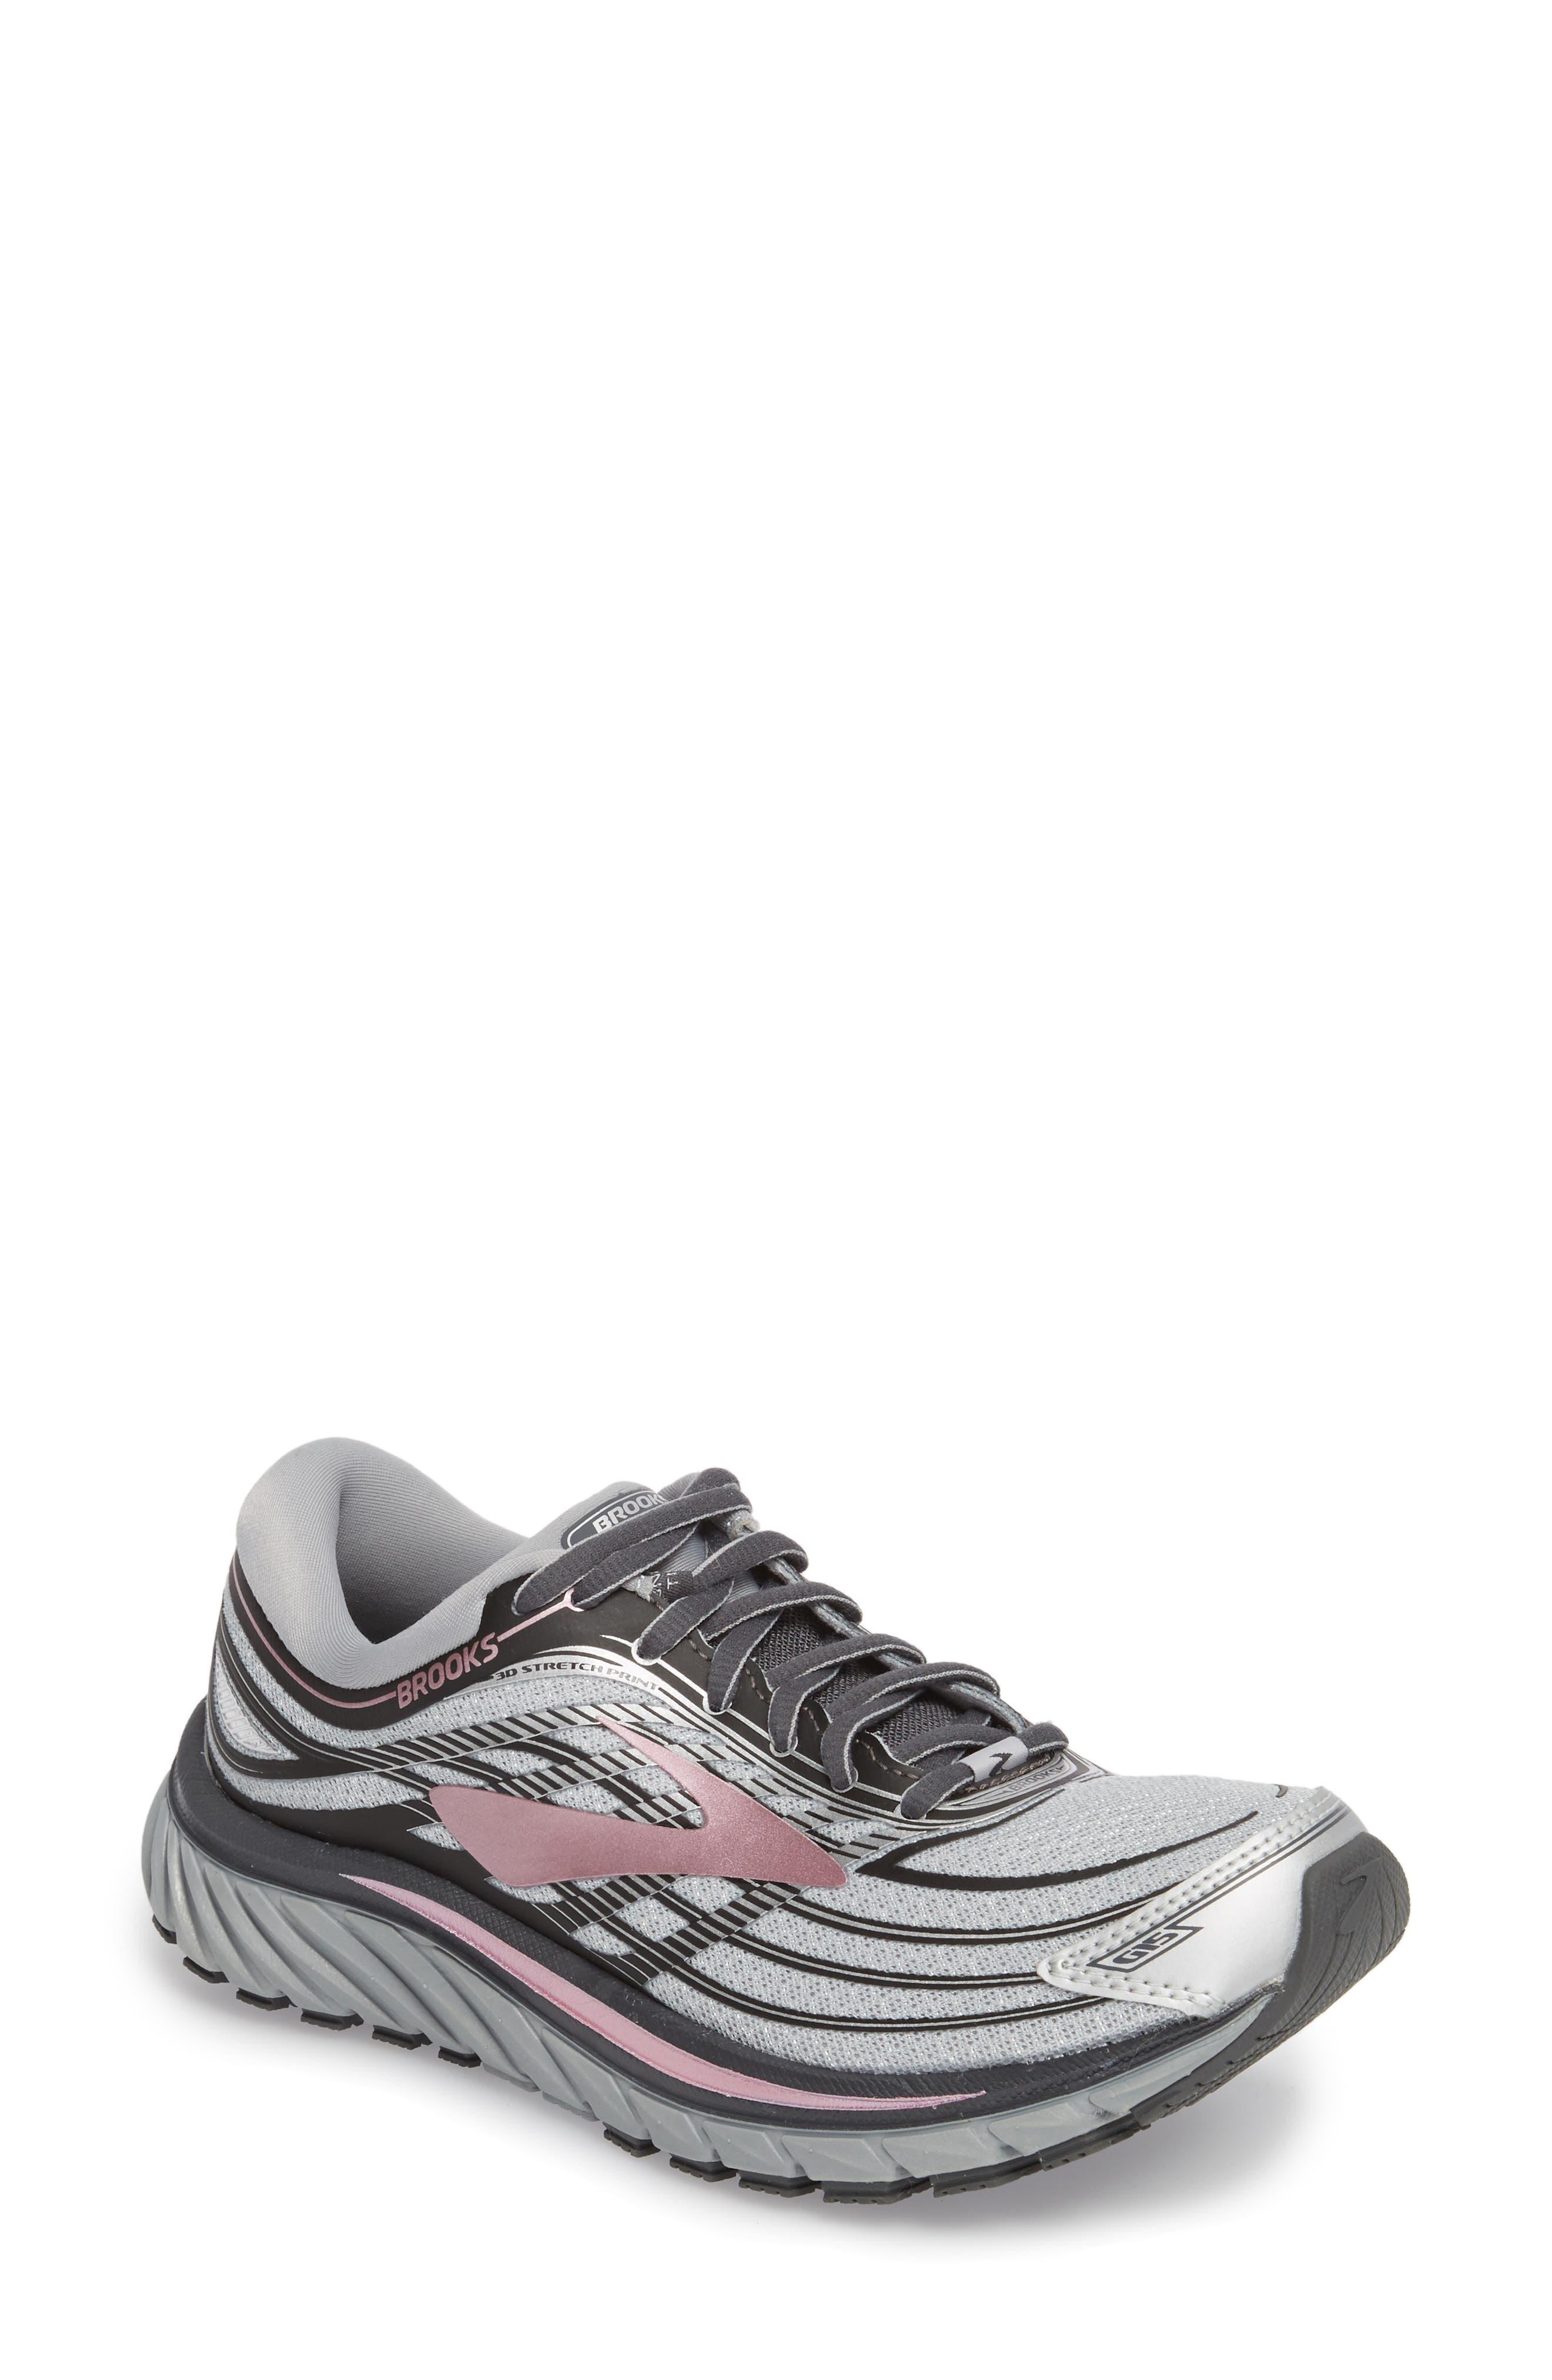 Glycerin 15 Running Shoe,                             Main thumbnail 1, color,                             057